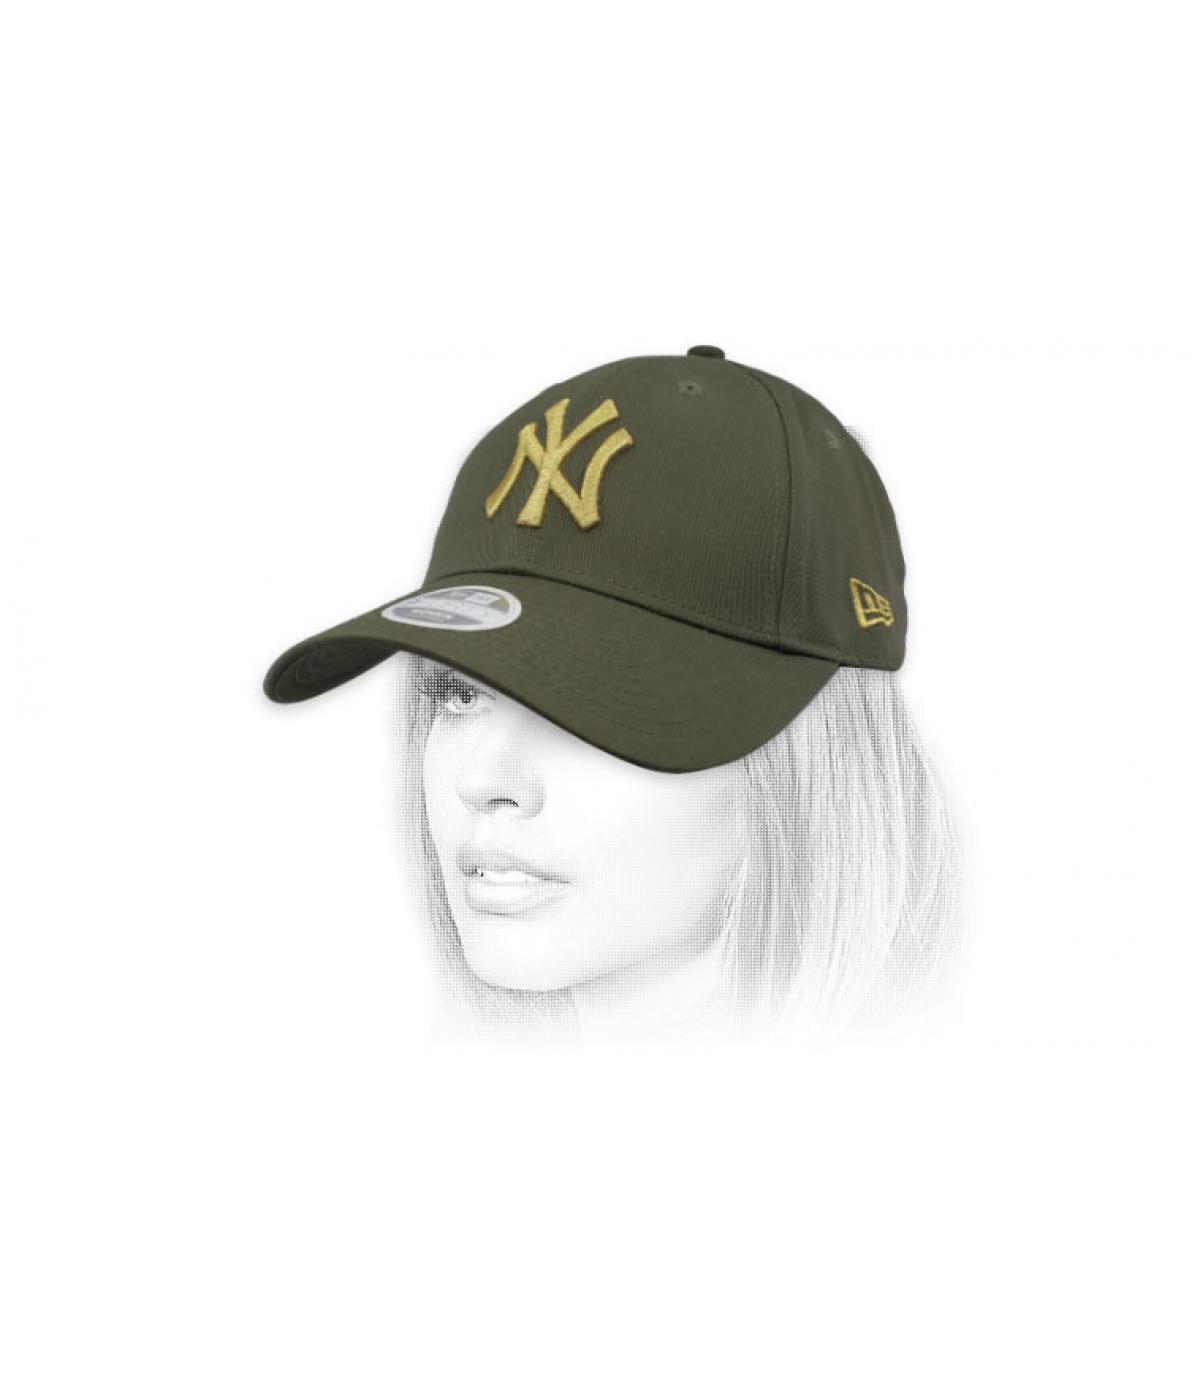 Kinder Cap NY grün Gold